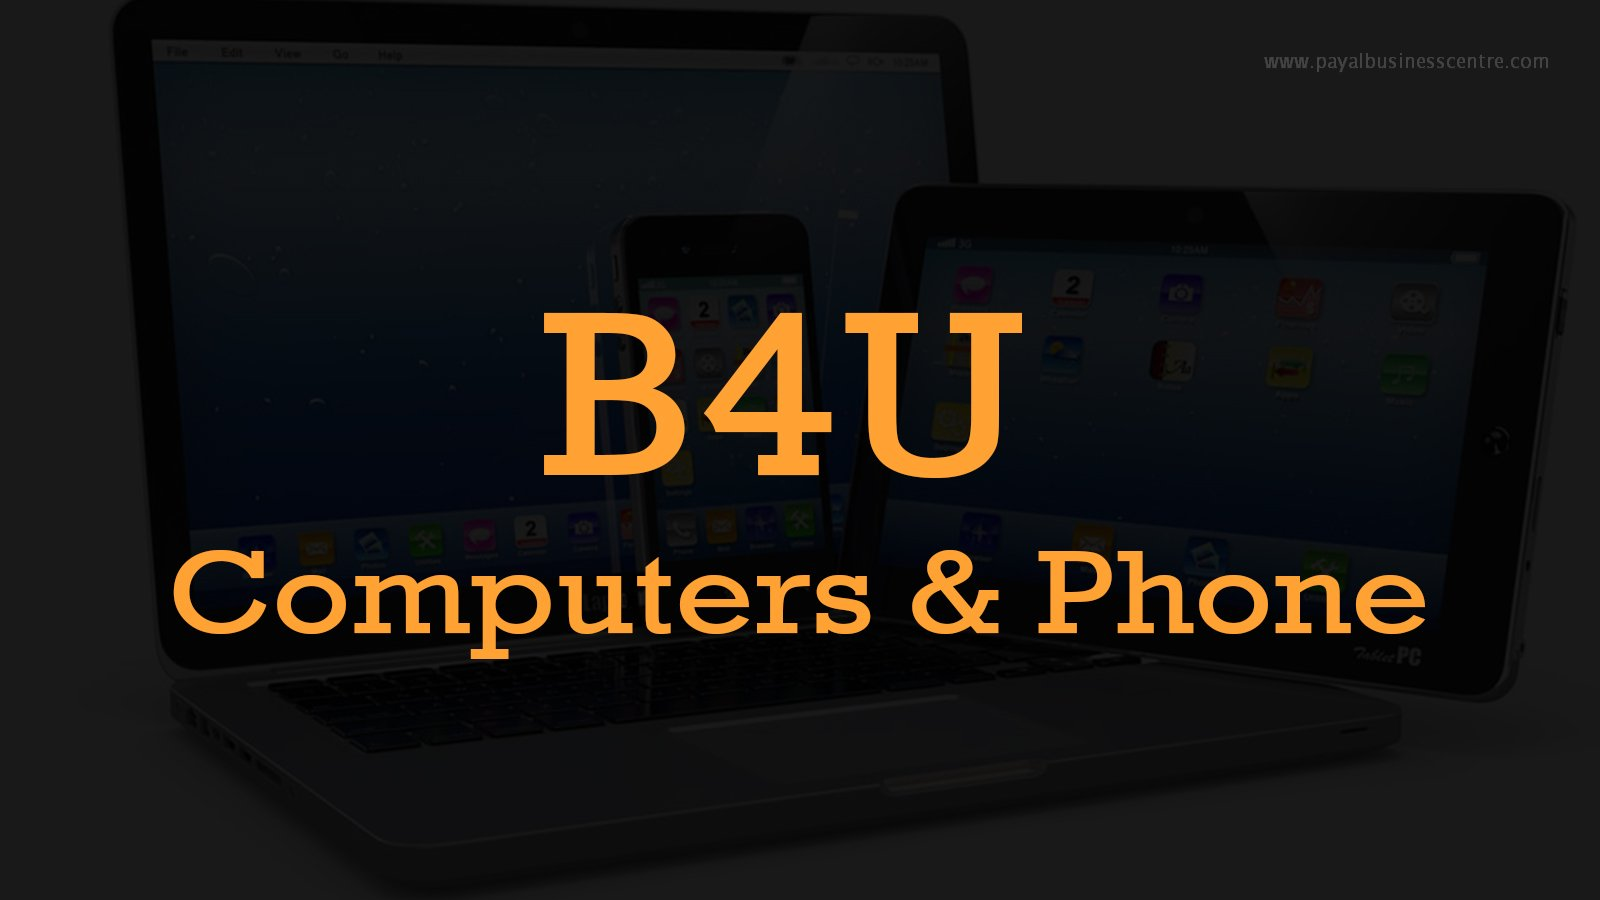 B4U Computers & Phone